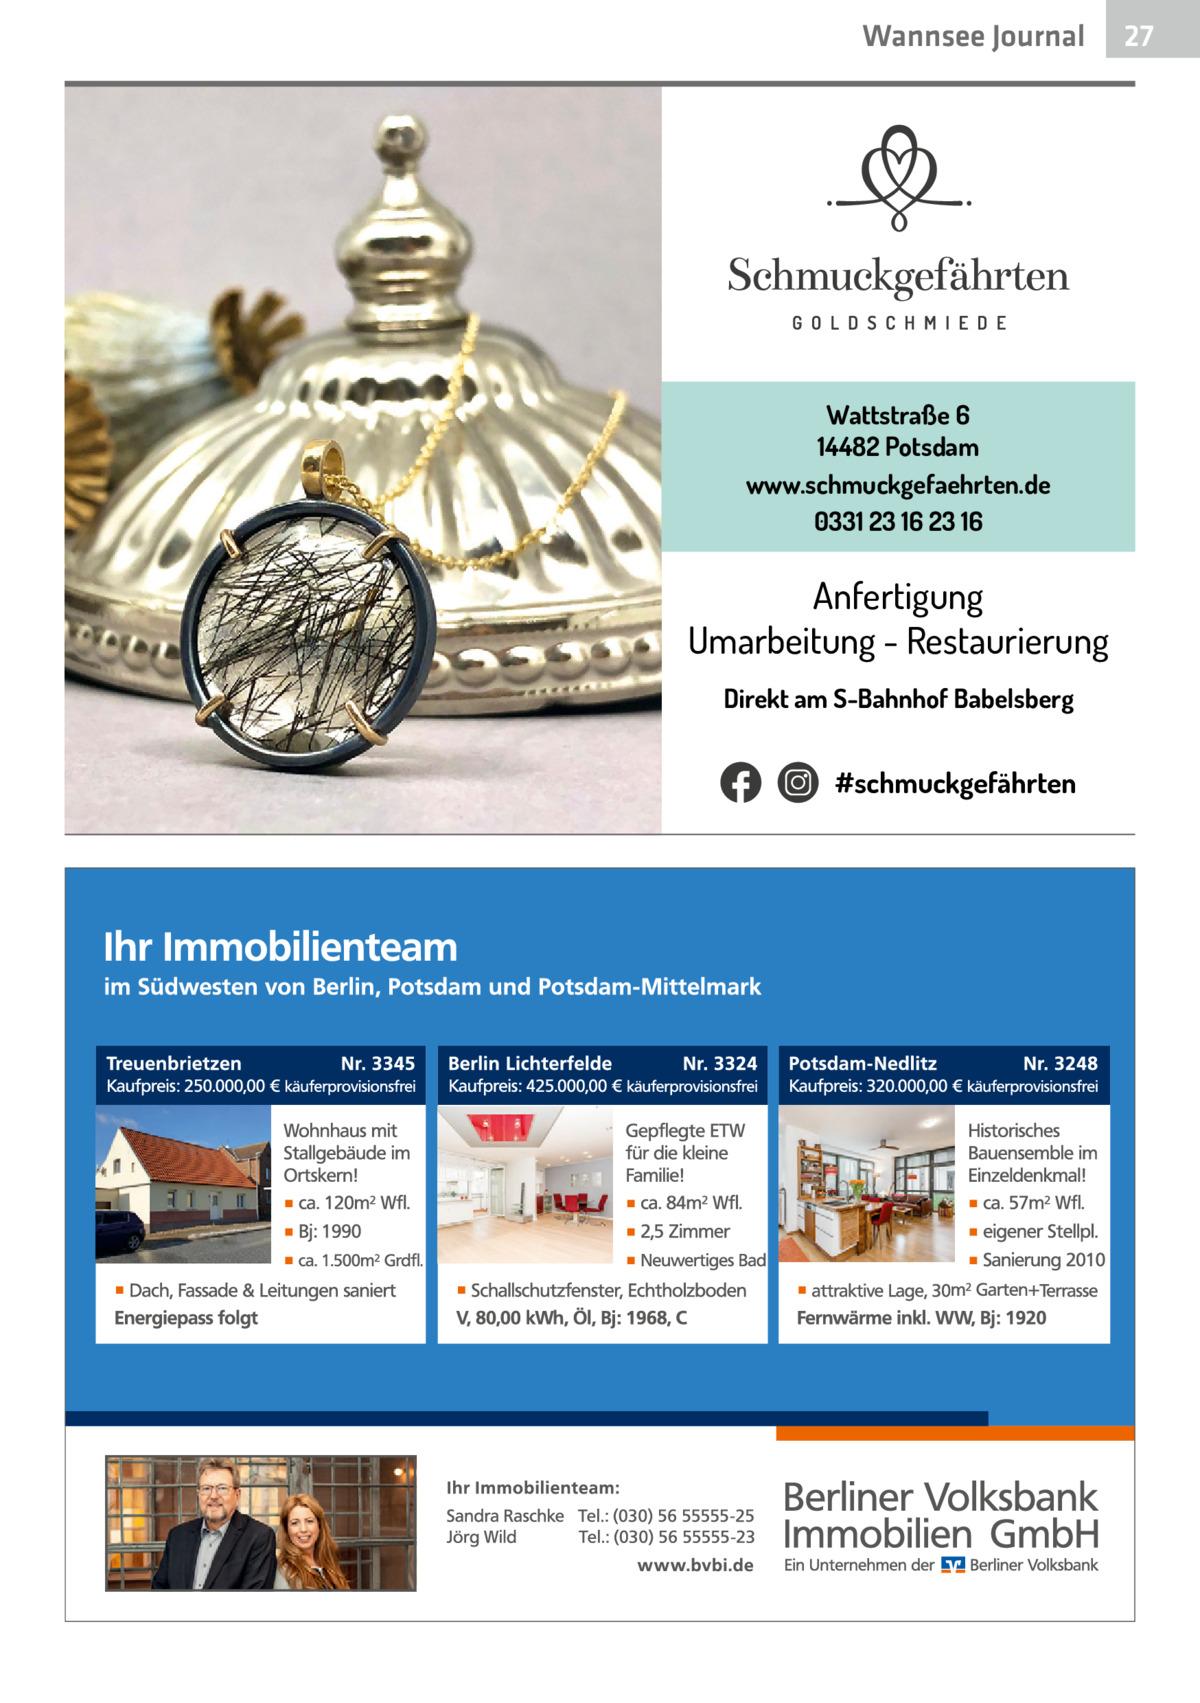 Wannsee Journal  Wattstraße 6 14482 Potsdam www.schmuckgefaehrten.de 0331 23 16 23 16  Anfertigung Umarbeitung - Restaurierung Direkt am S-Bahnhof Babelsberg  #schmuckgefährten  27